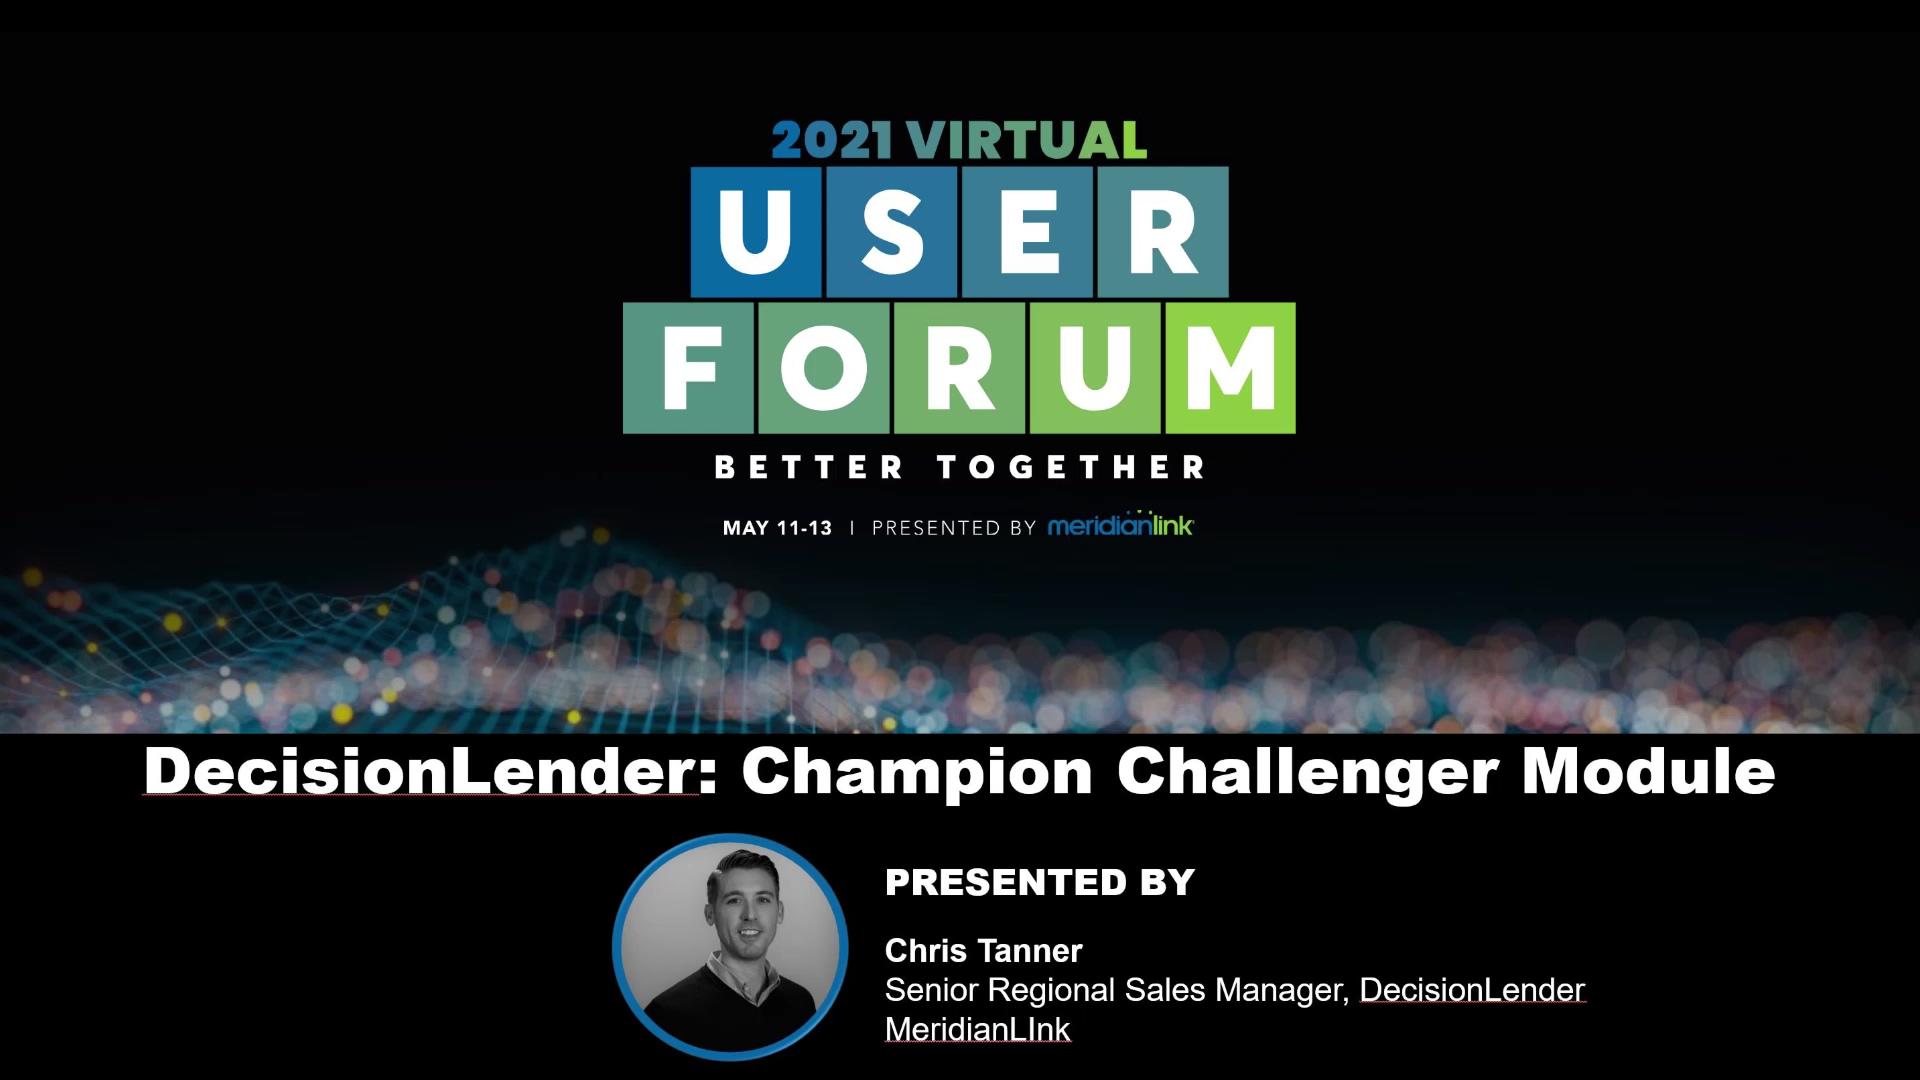 DecisionLender Champion Challenger Module